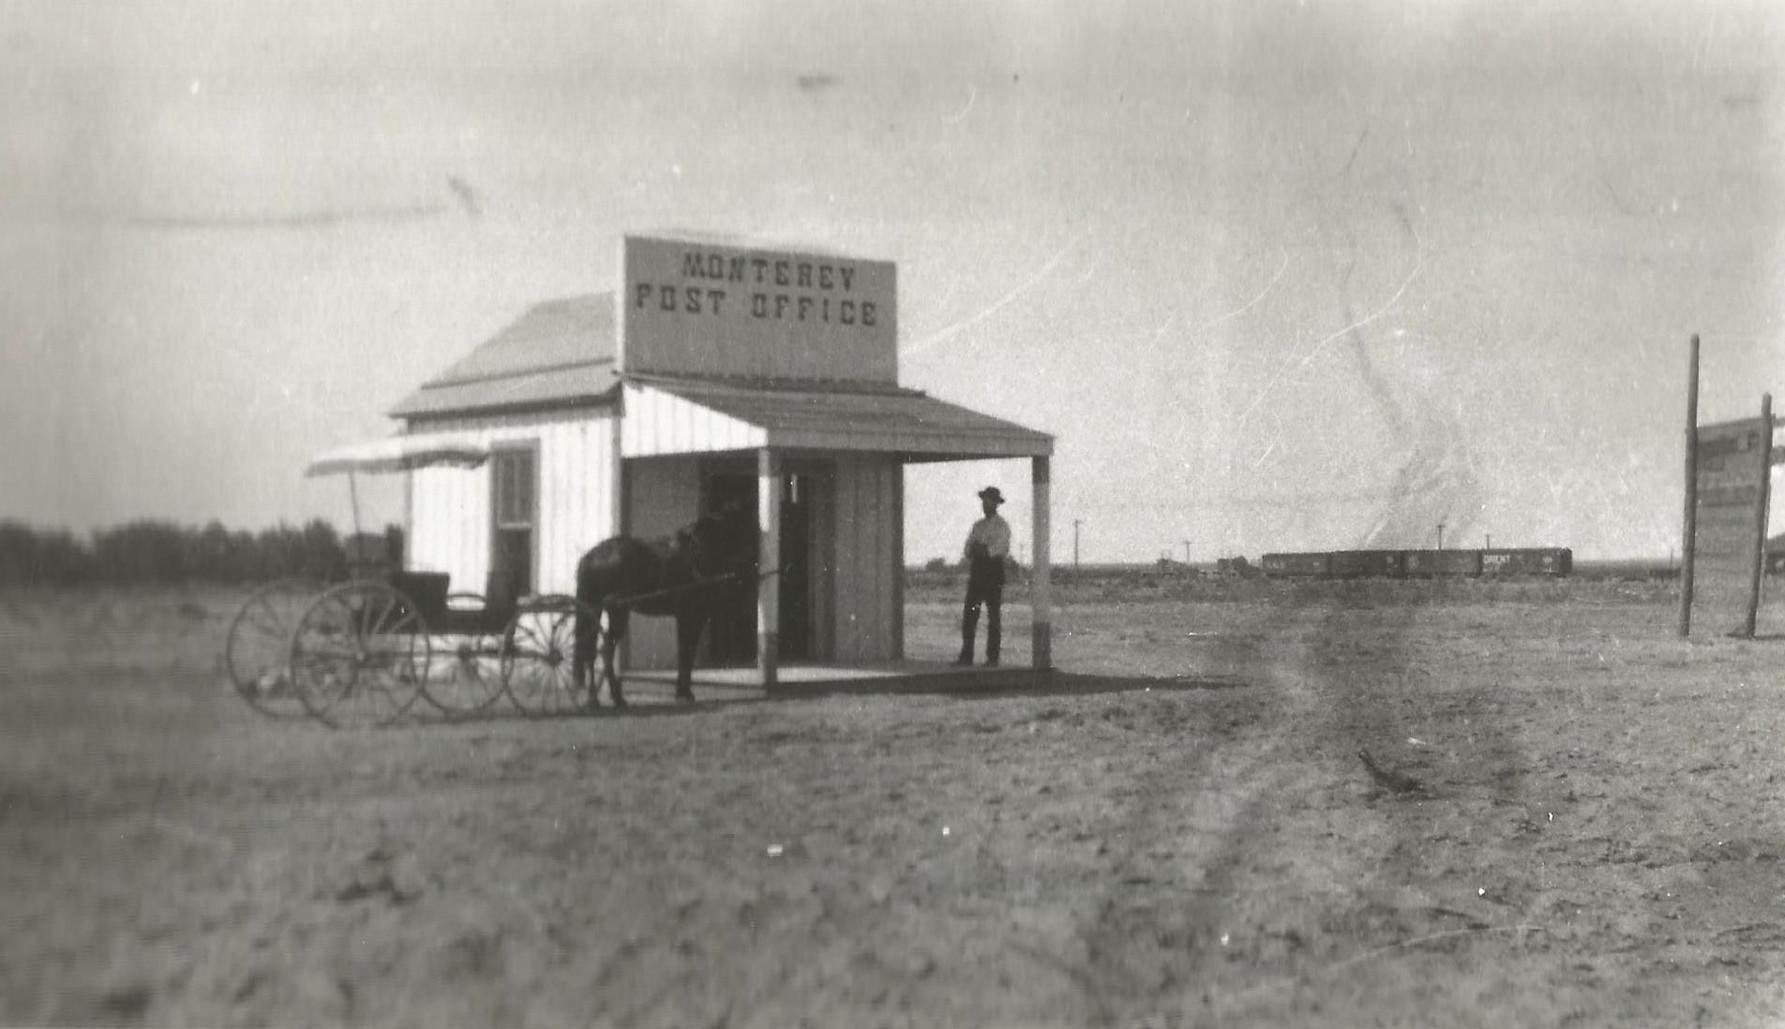 Monterey, New Mexico Post Office